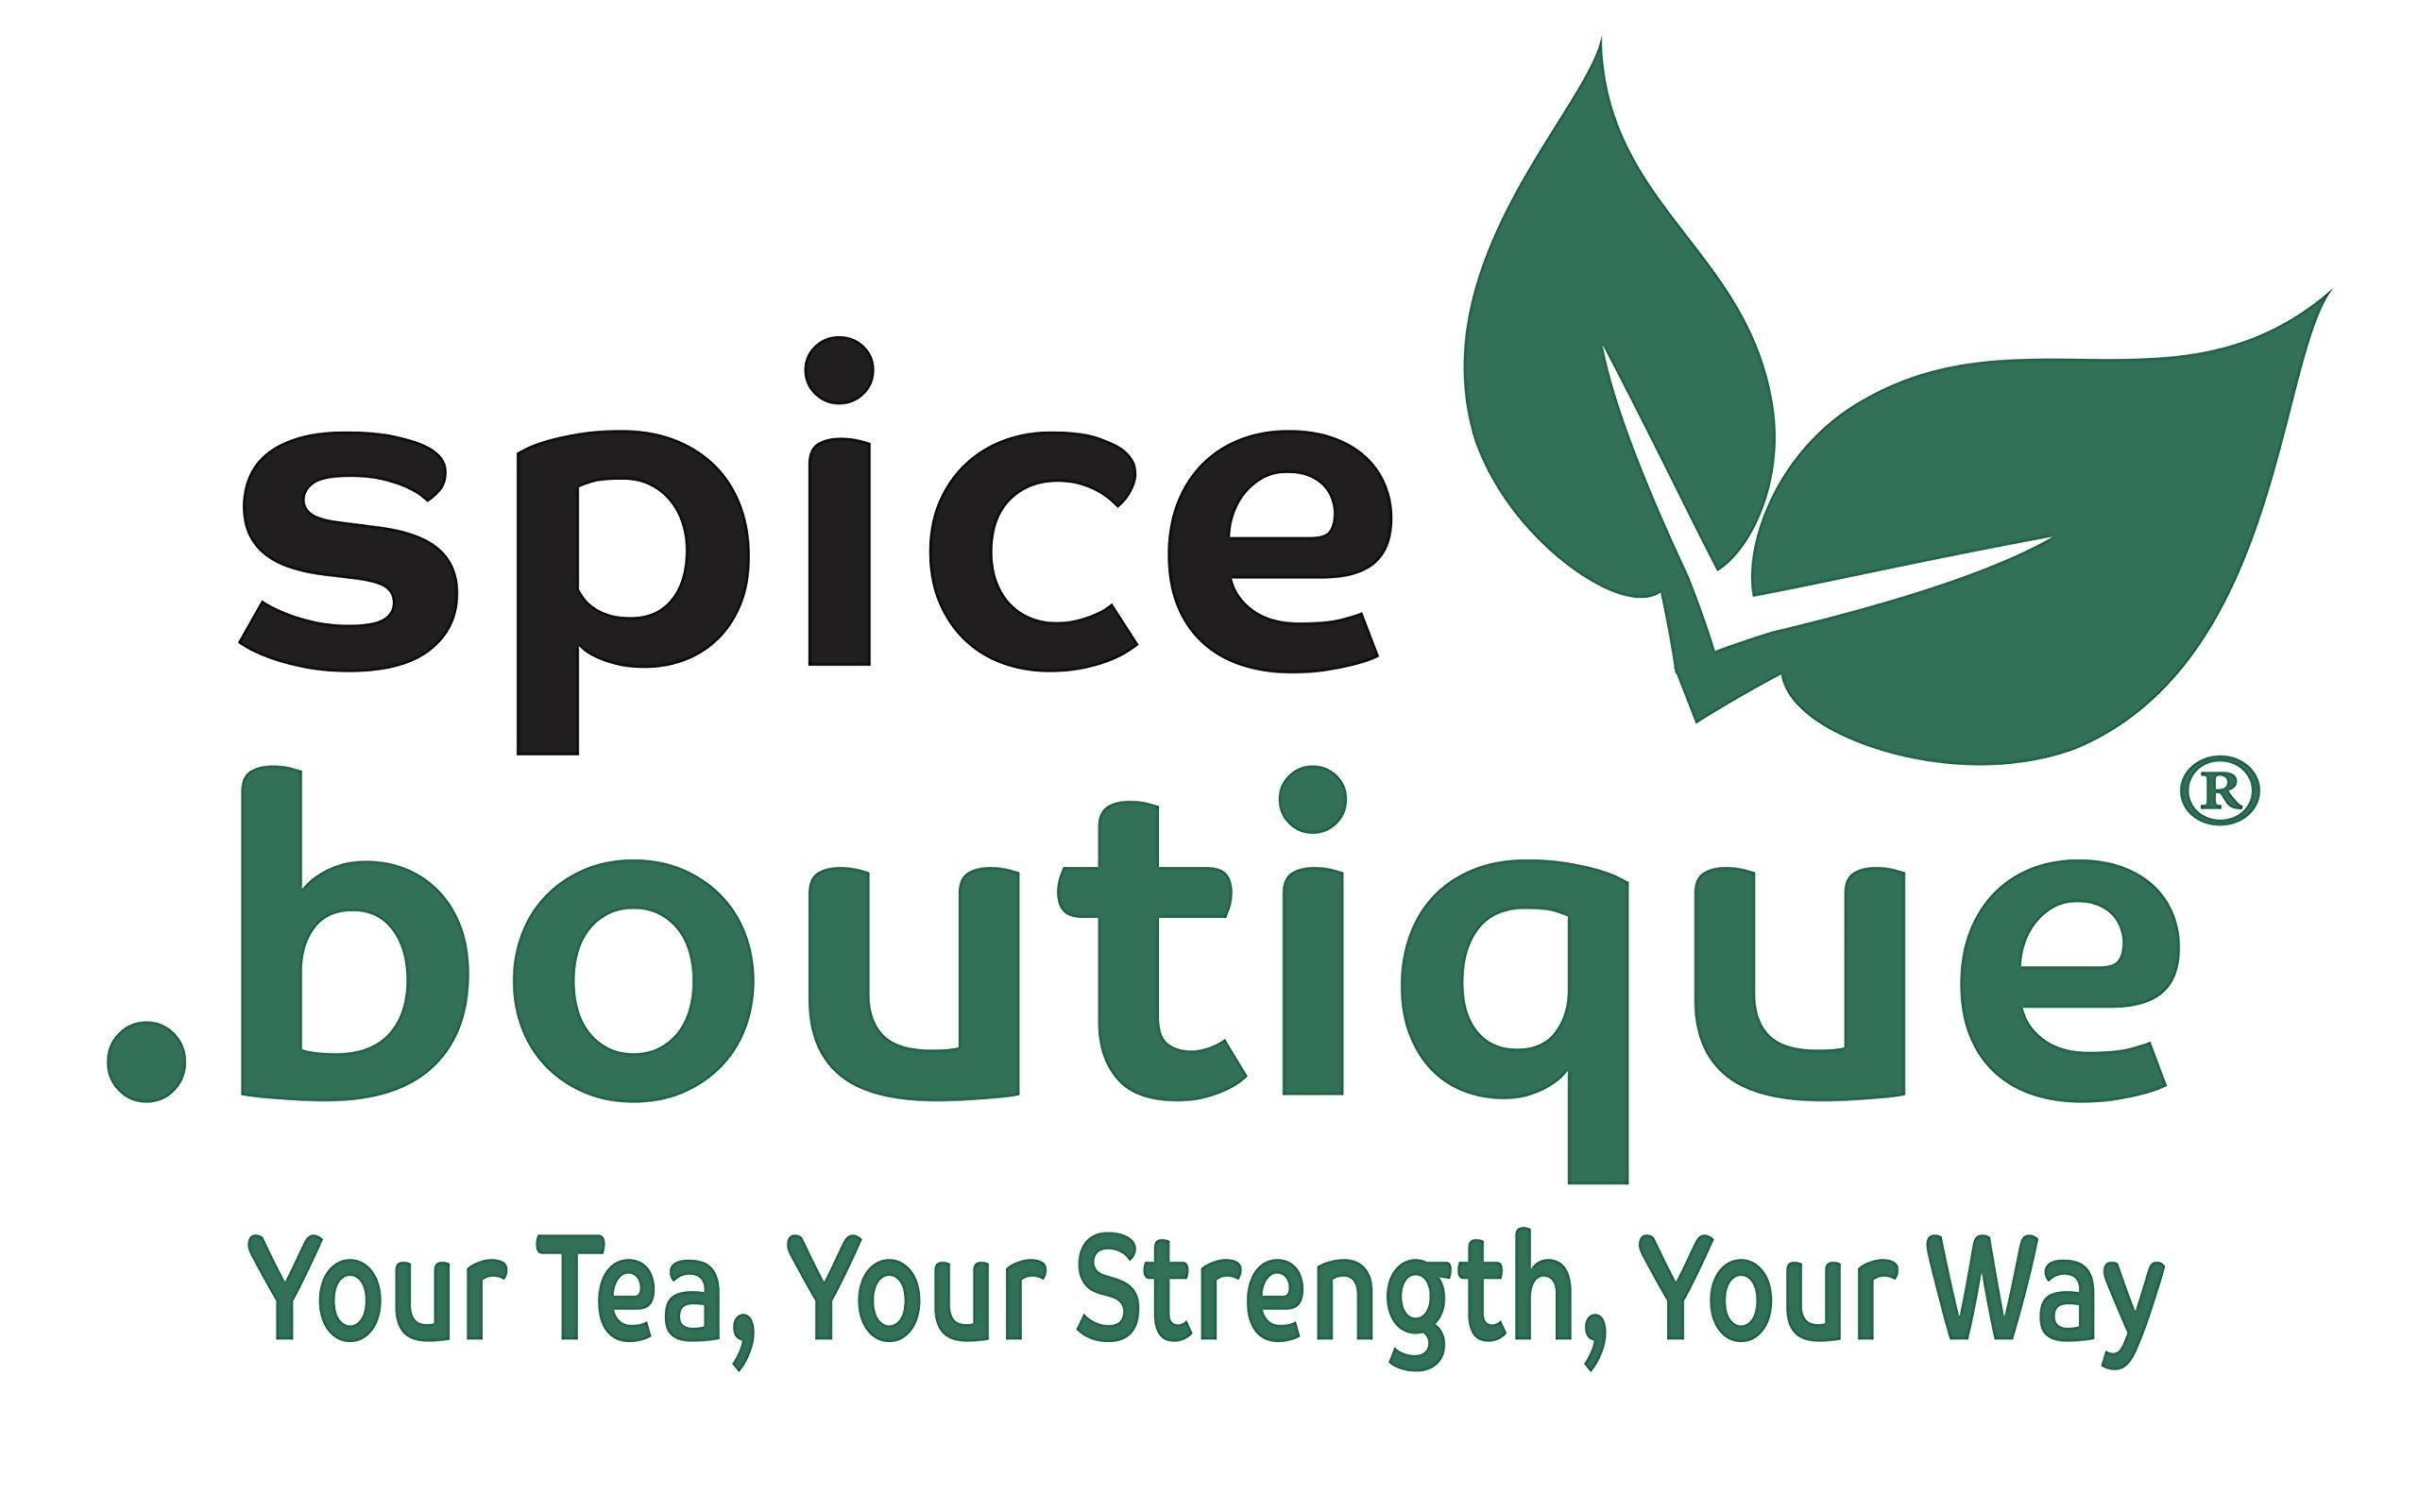 Spice.boutique Unbleached Paper Self Fill Teabags, Plastic Free, One Pot Size 7x9cm, 500